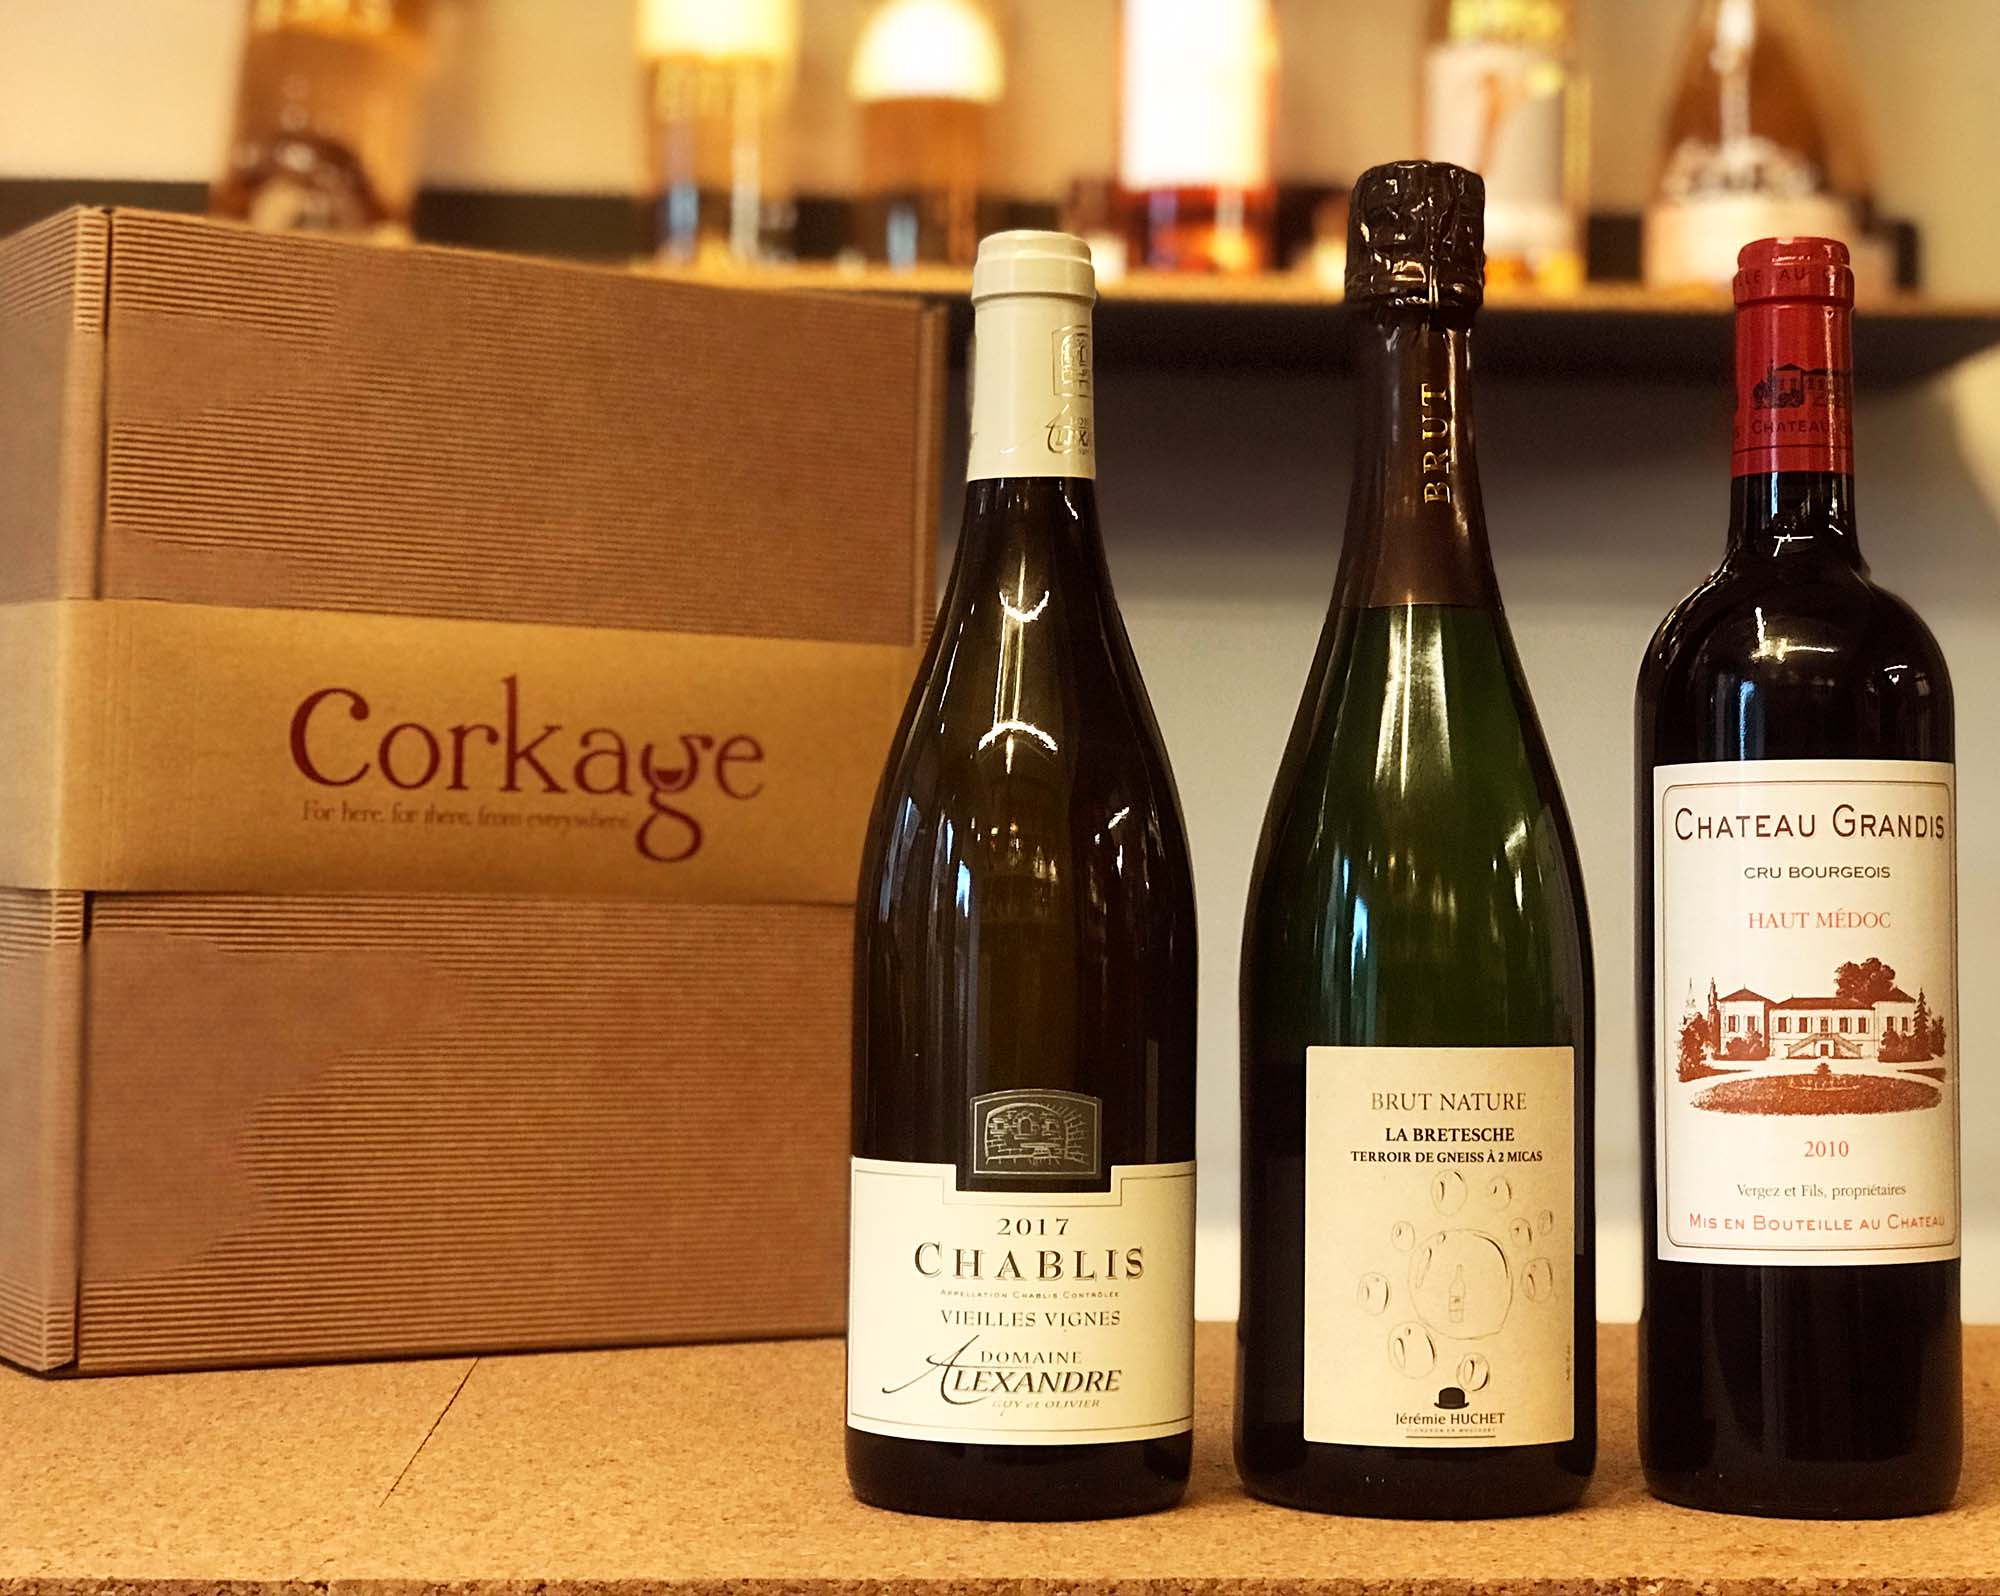 £50 Corkage Wine Gift Box